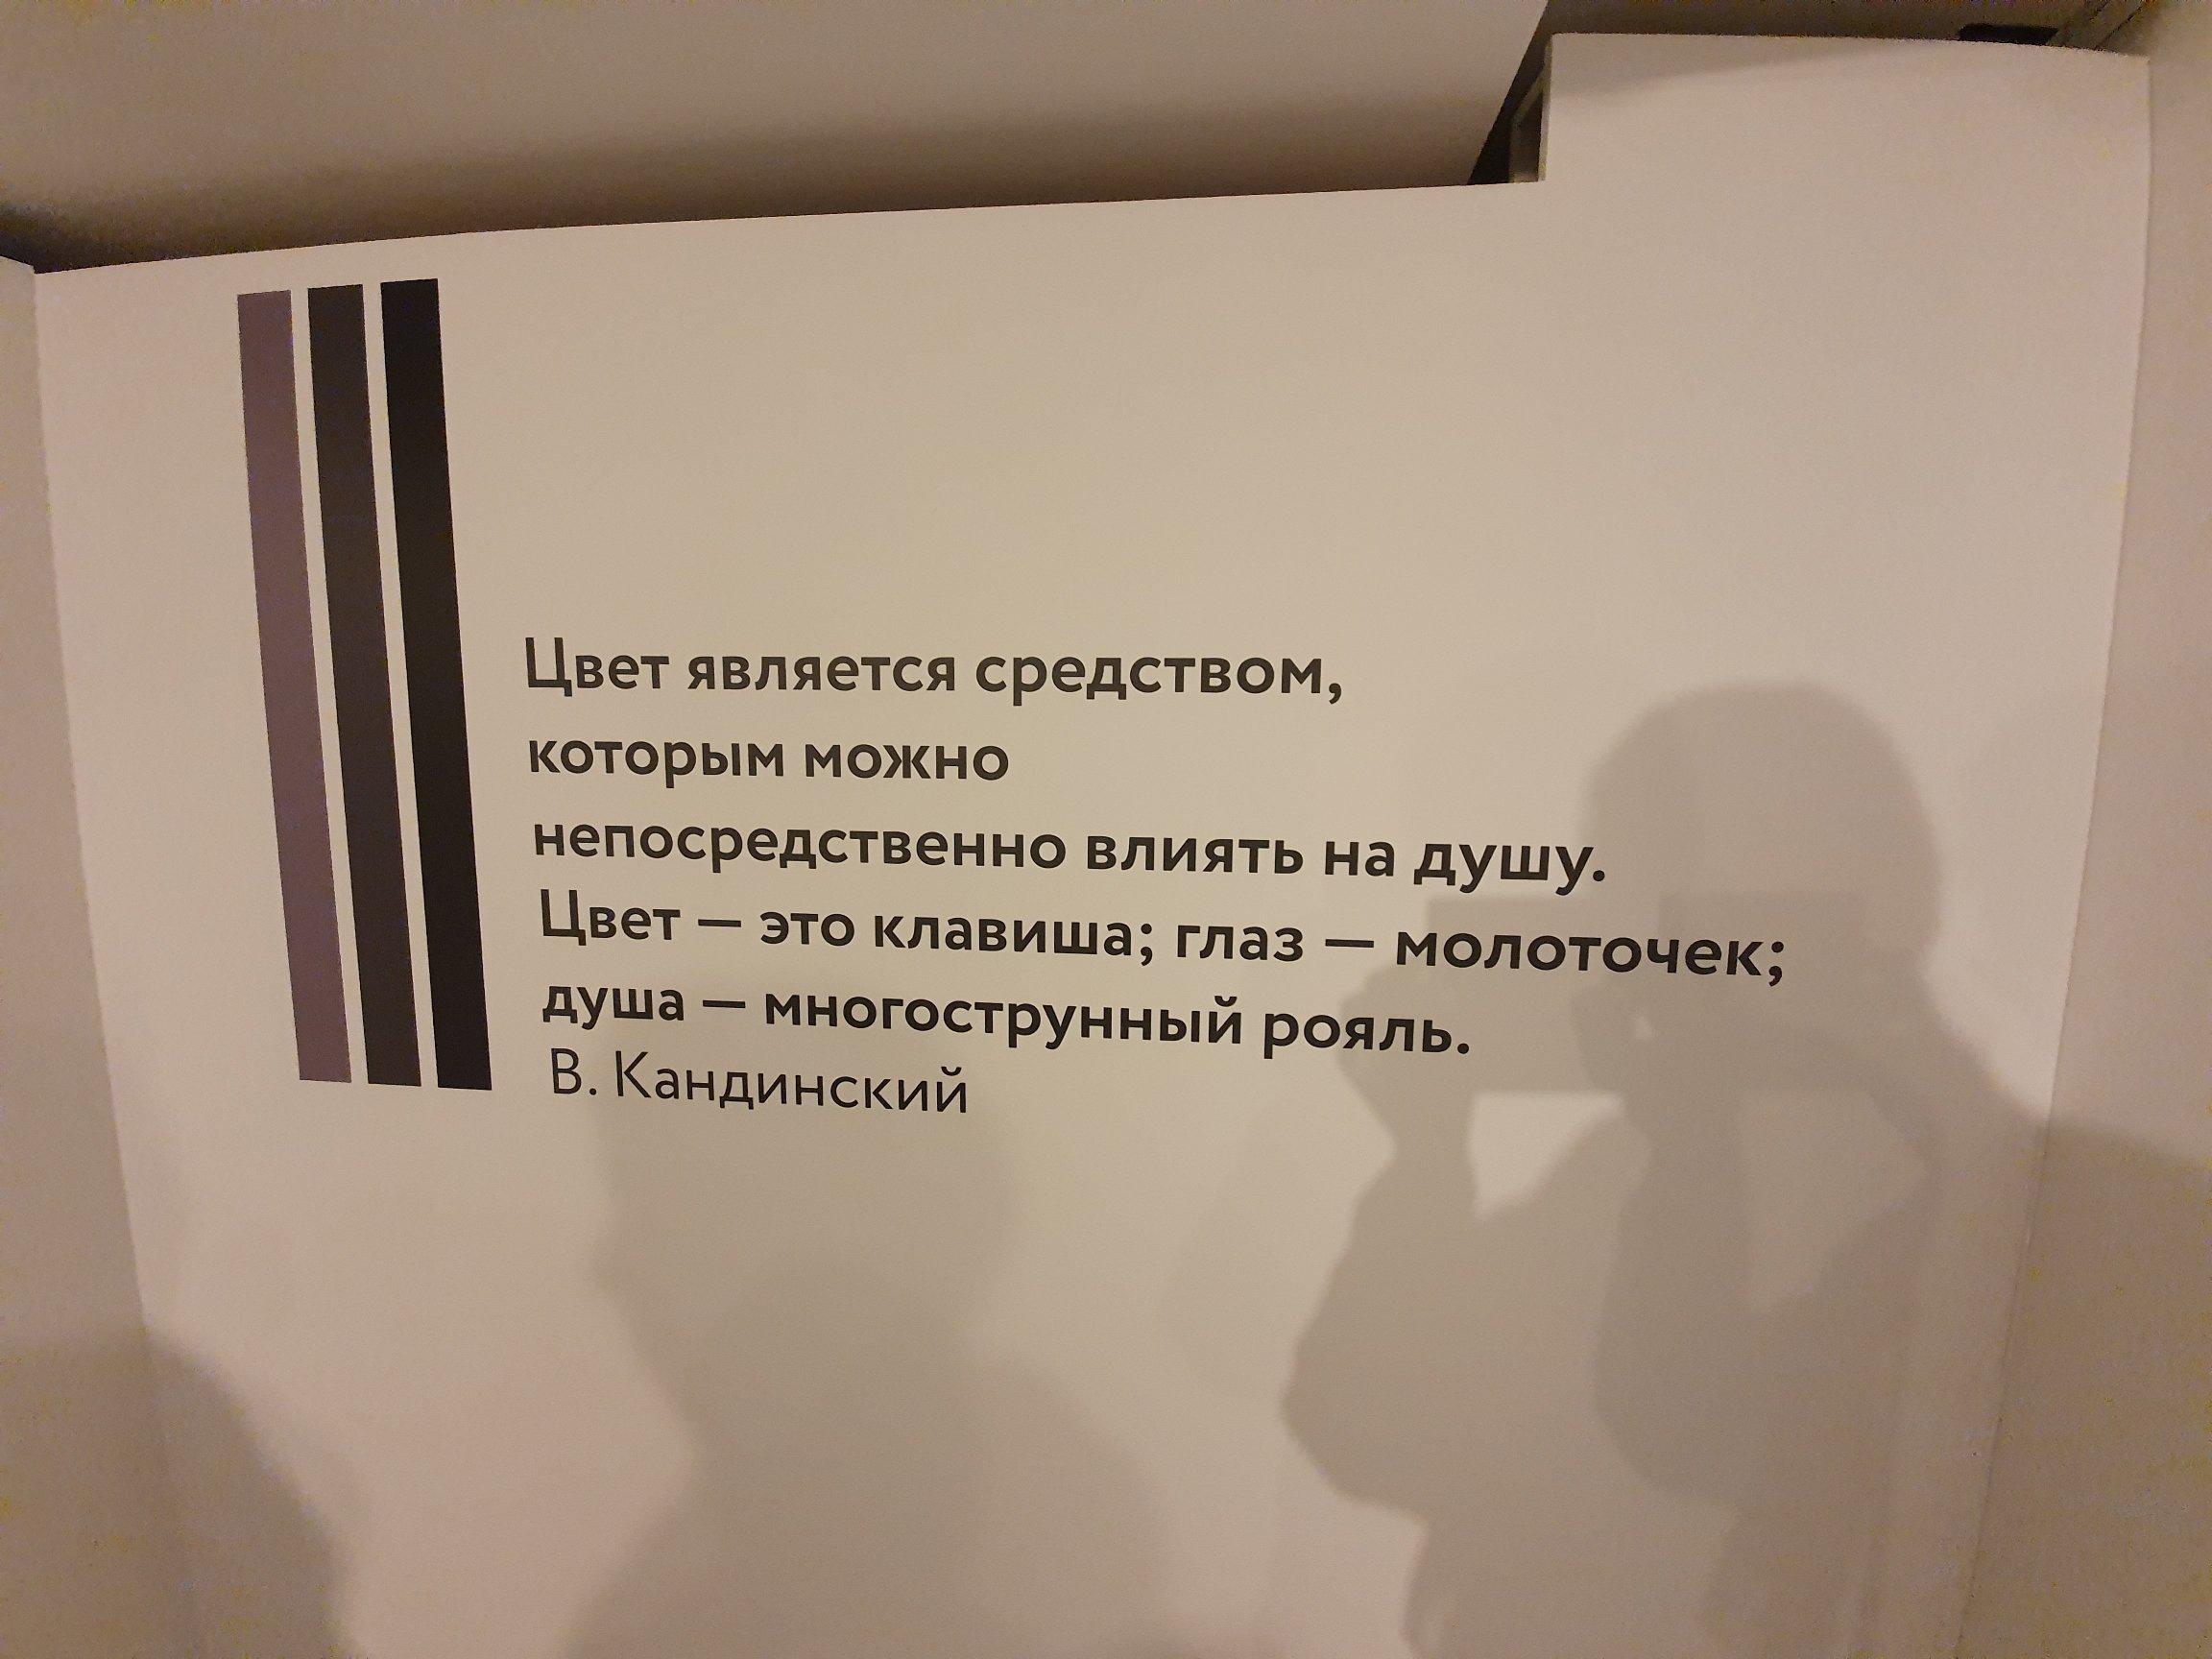 007 20200102_155503~1